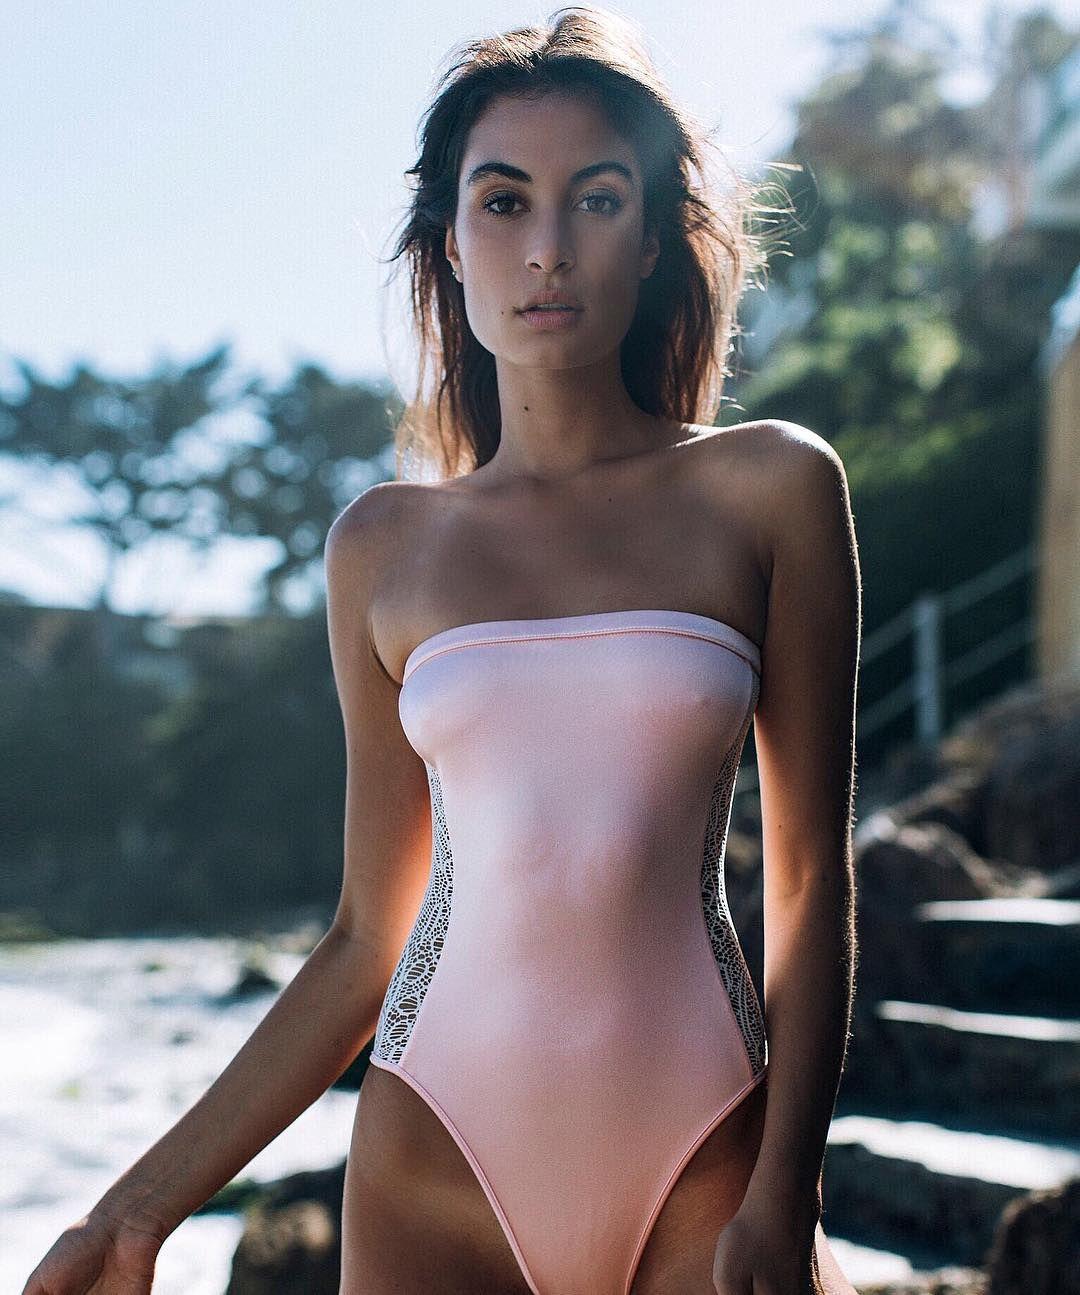 Milena Gorum nude (14 fotos), pics Fappening, Instagram, in bikini 2016